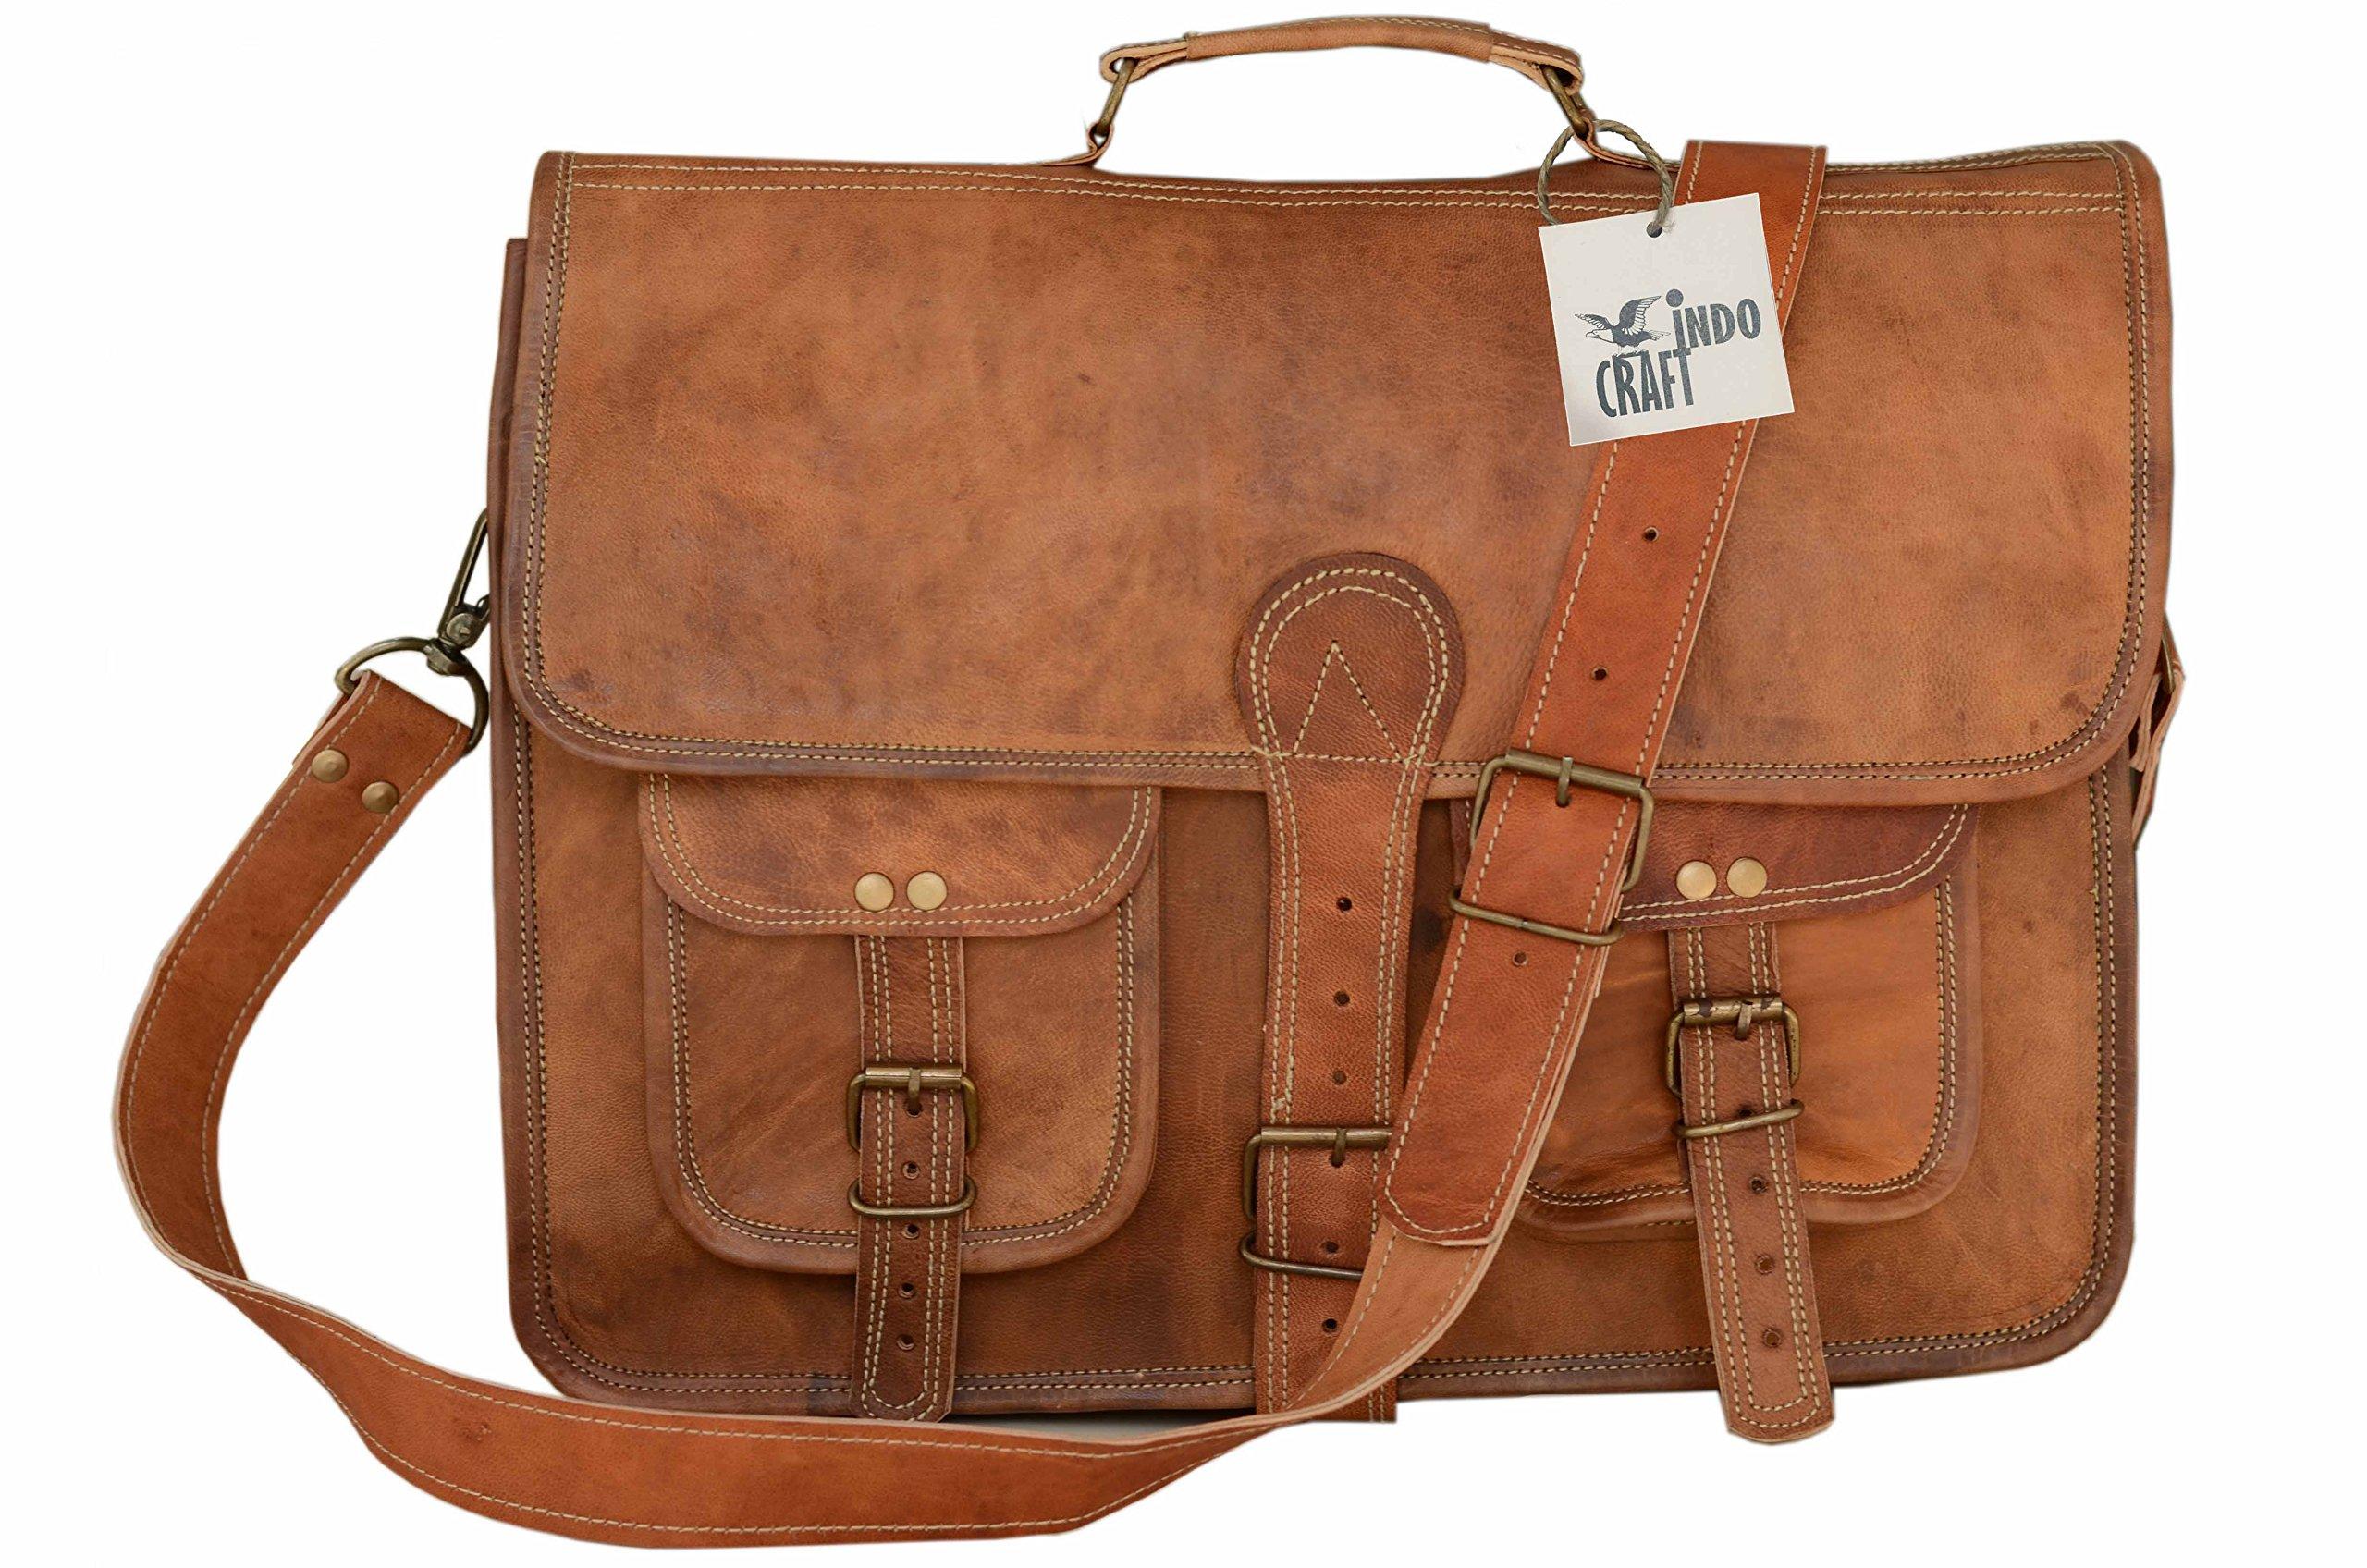 Indo Craft Leather Laptop Messenger Bag Half Flap Unisex 10